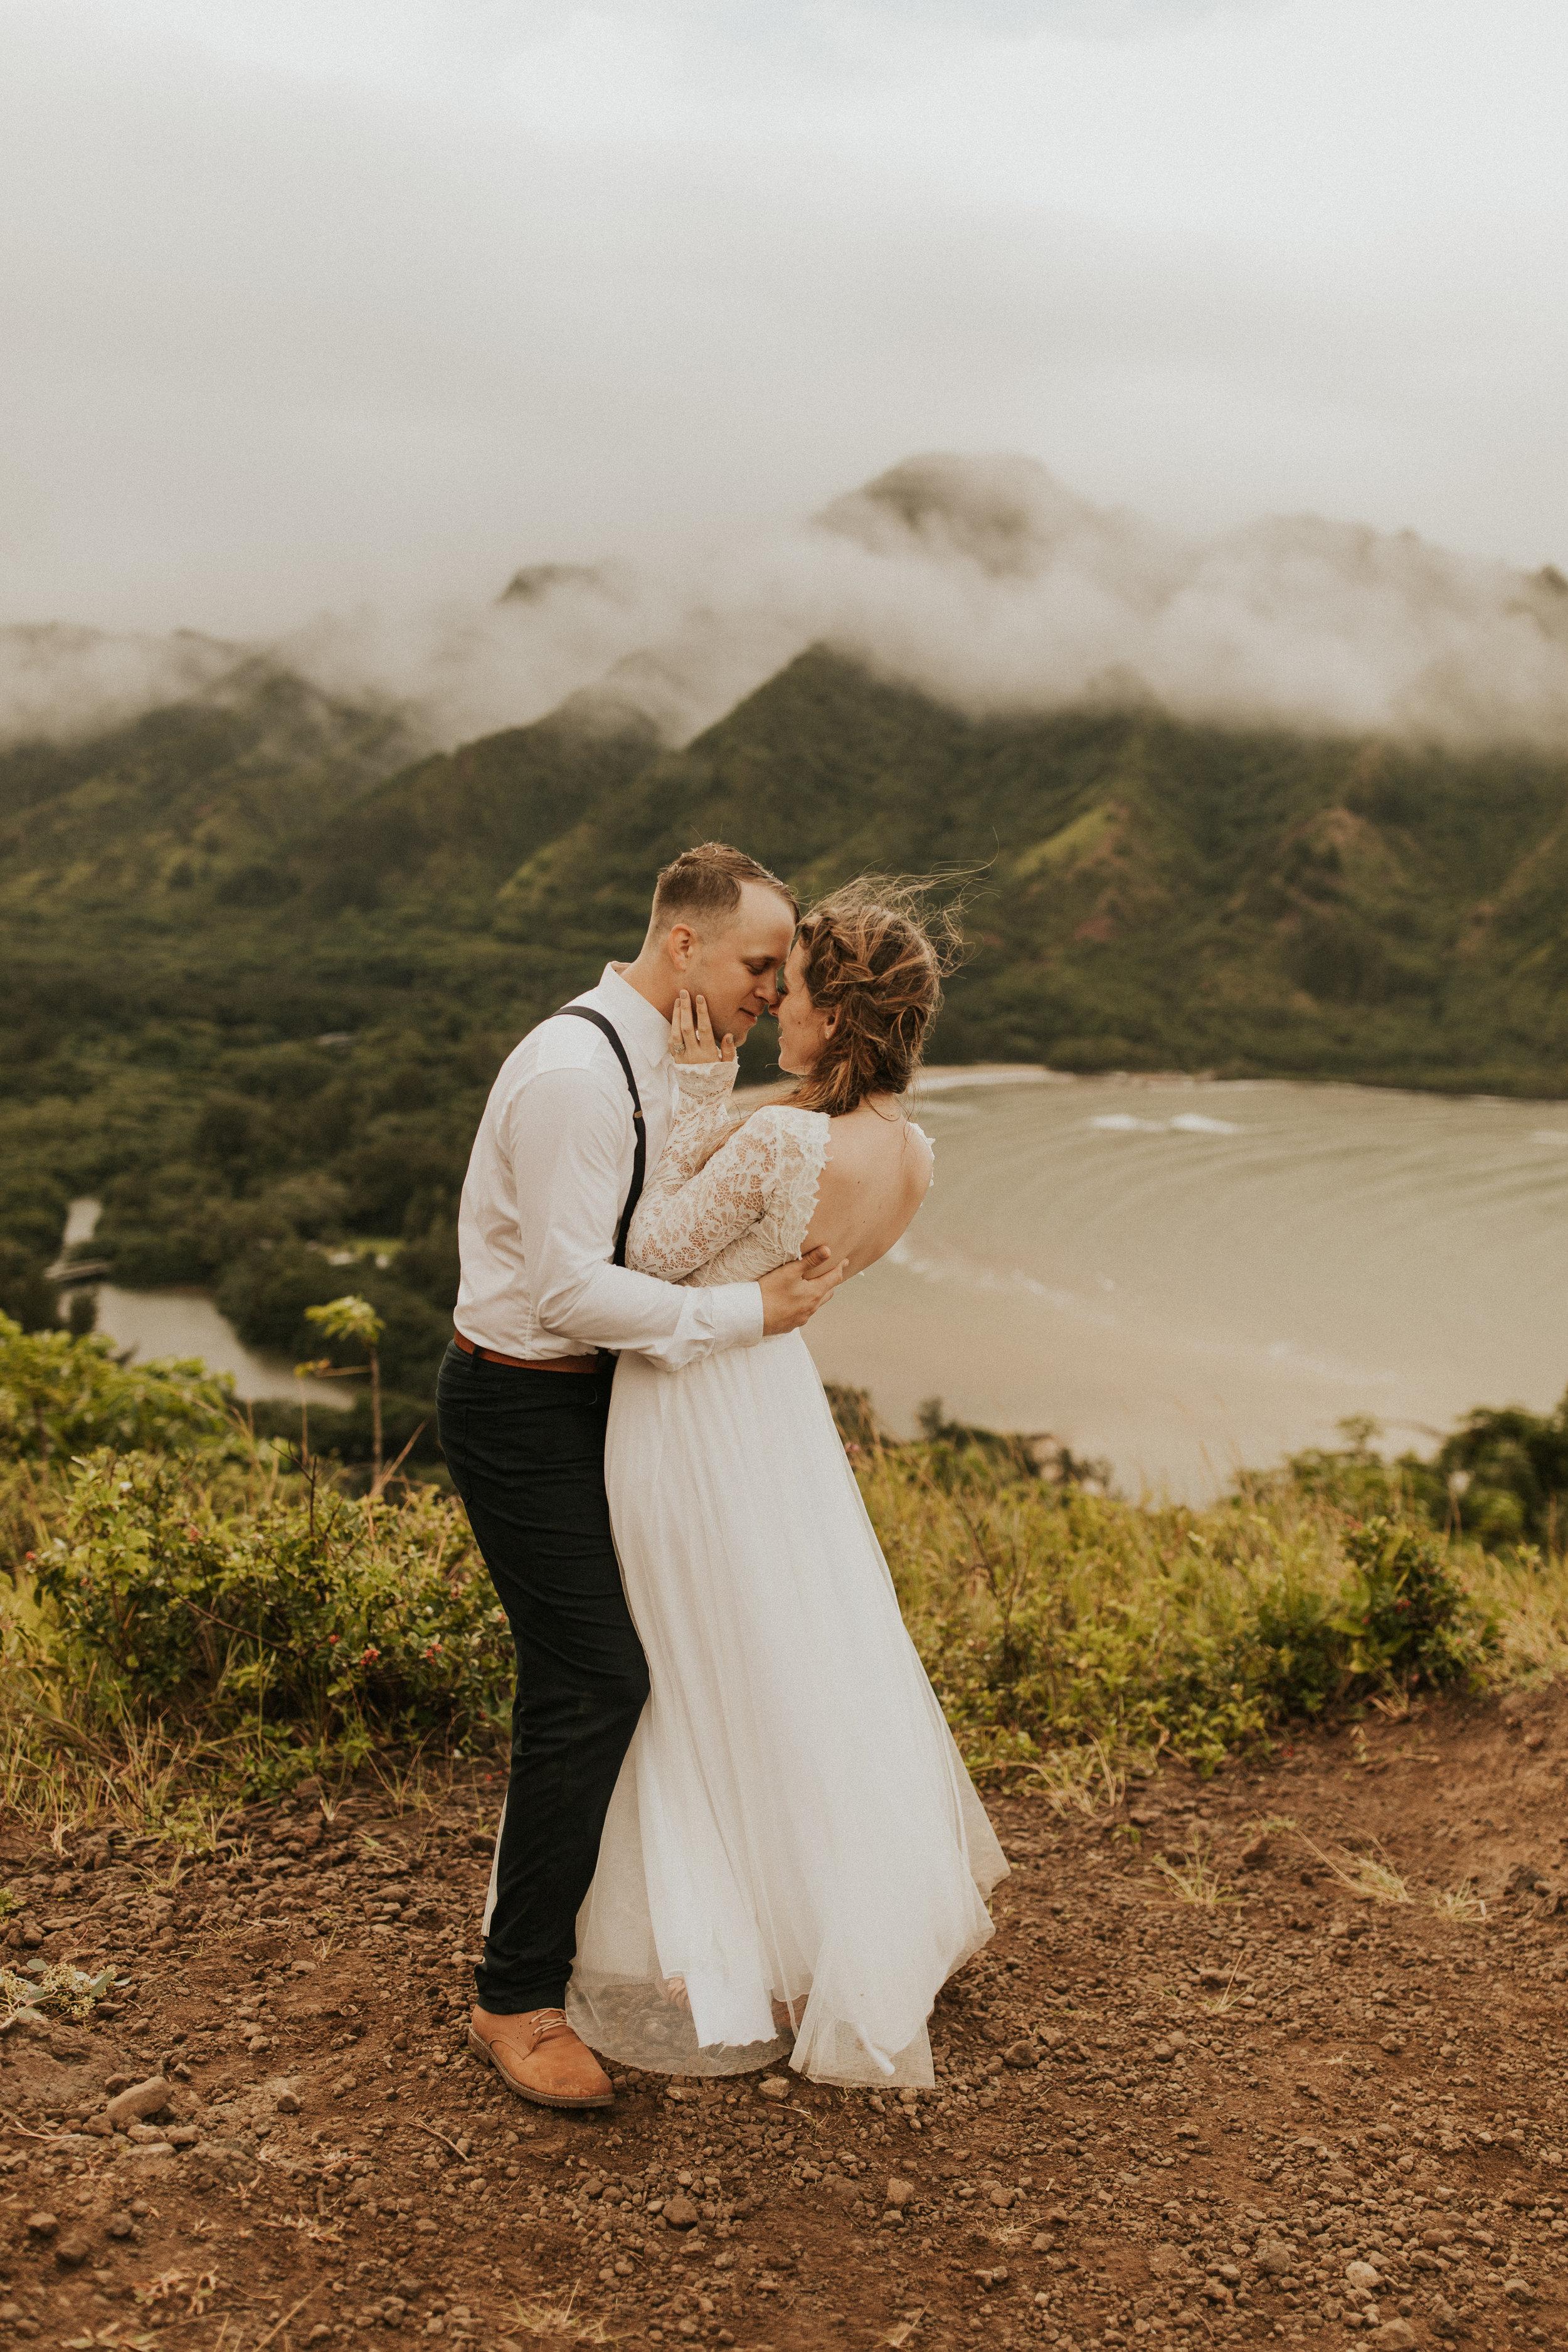 the-mclachlans-destination-elopement-photographers-mountain-hike-sena-eric-149.jpg